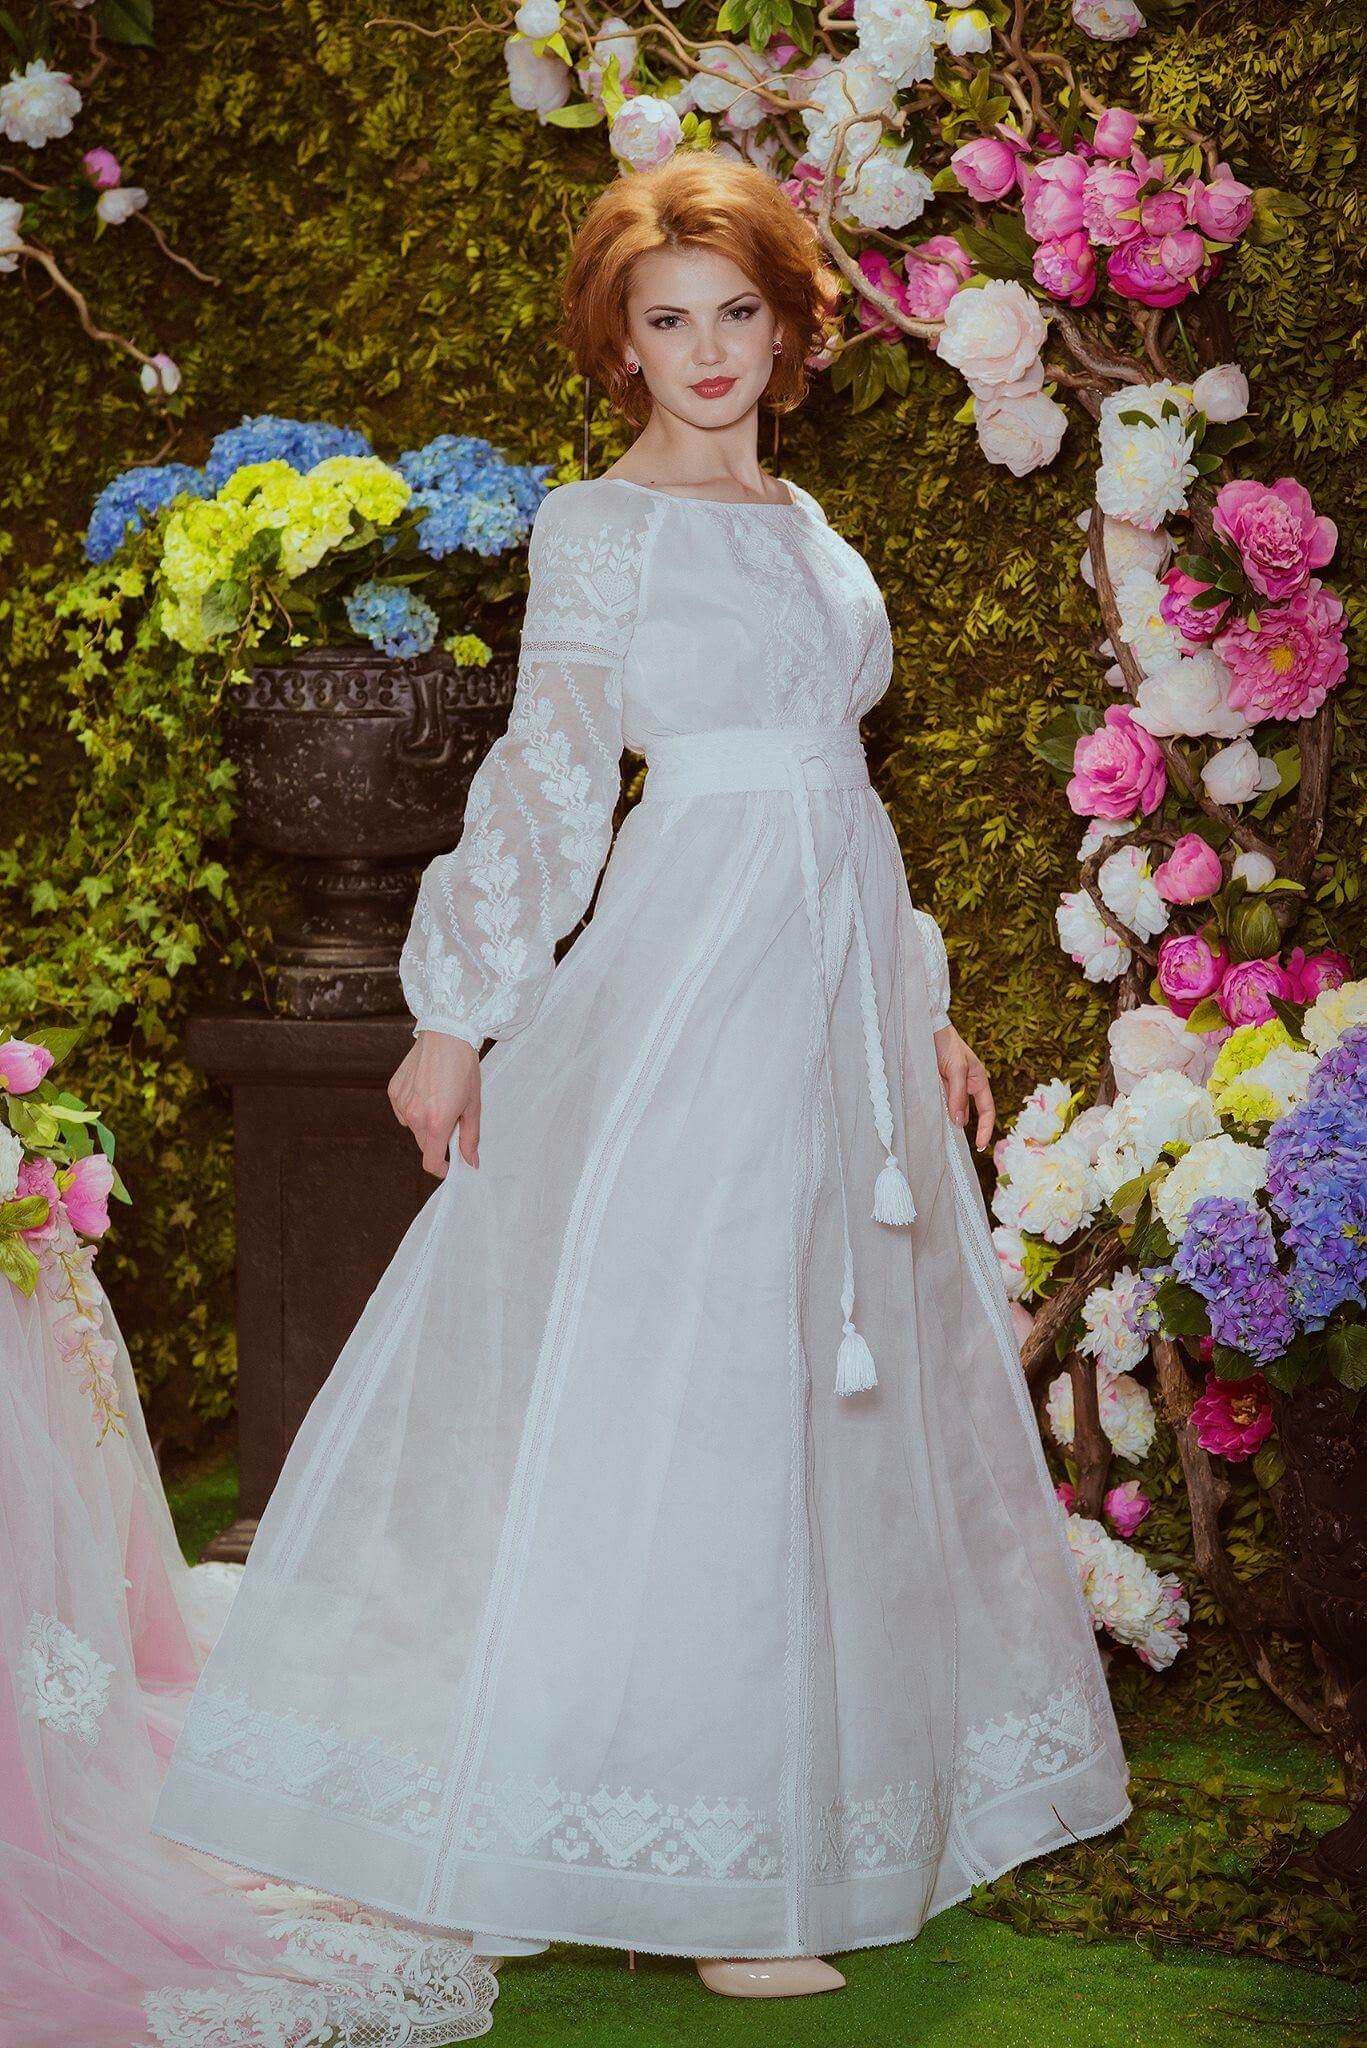 Colorful Essense Wedding Dresses Adornment - All Wedding Dresses ...